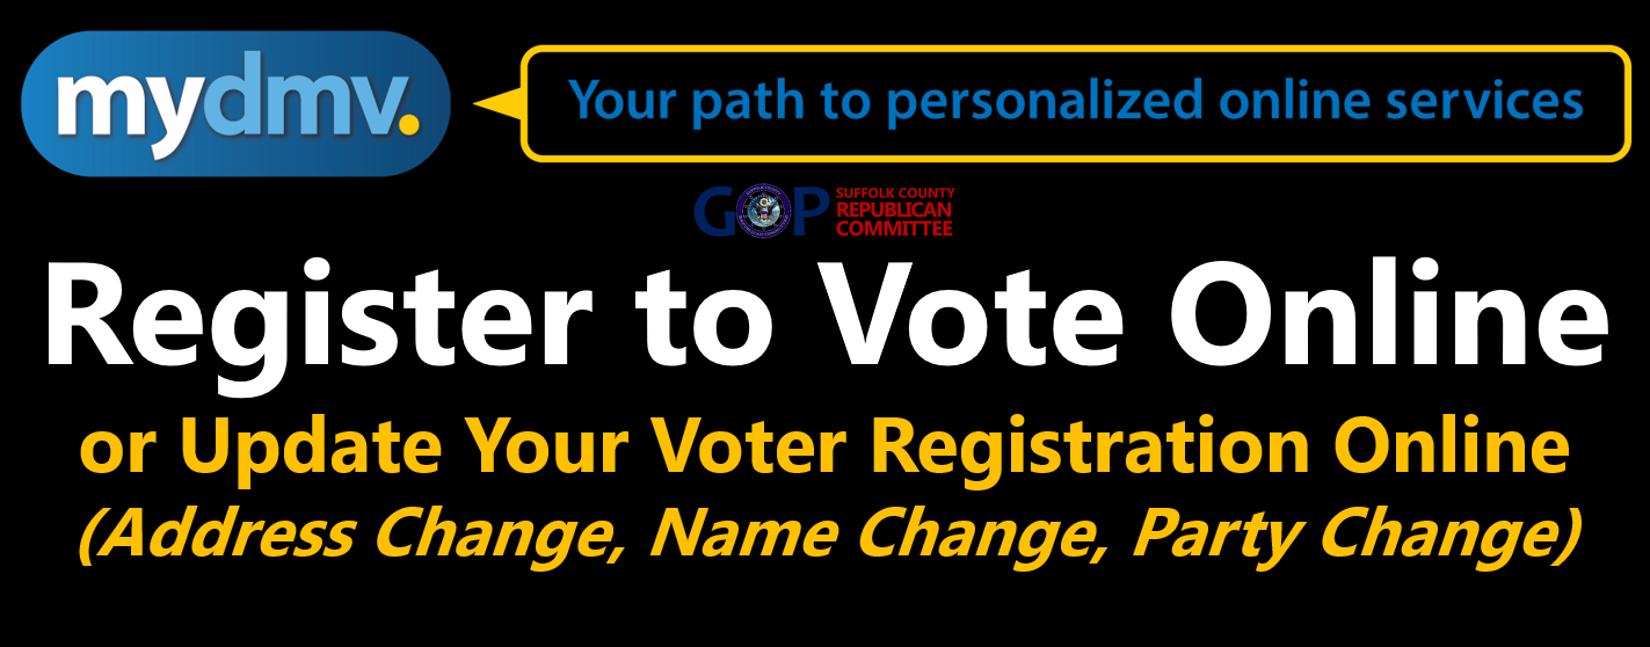 Register to Vote/Update Your Voter Registration Online